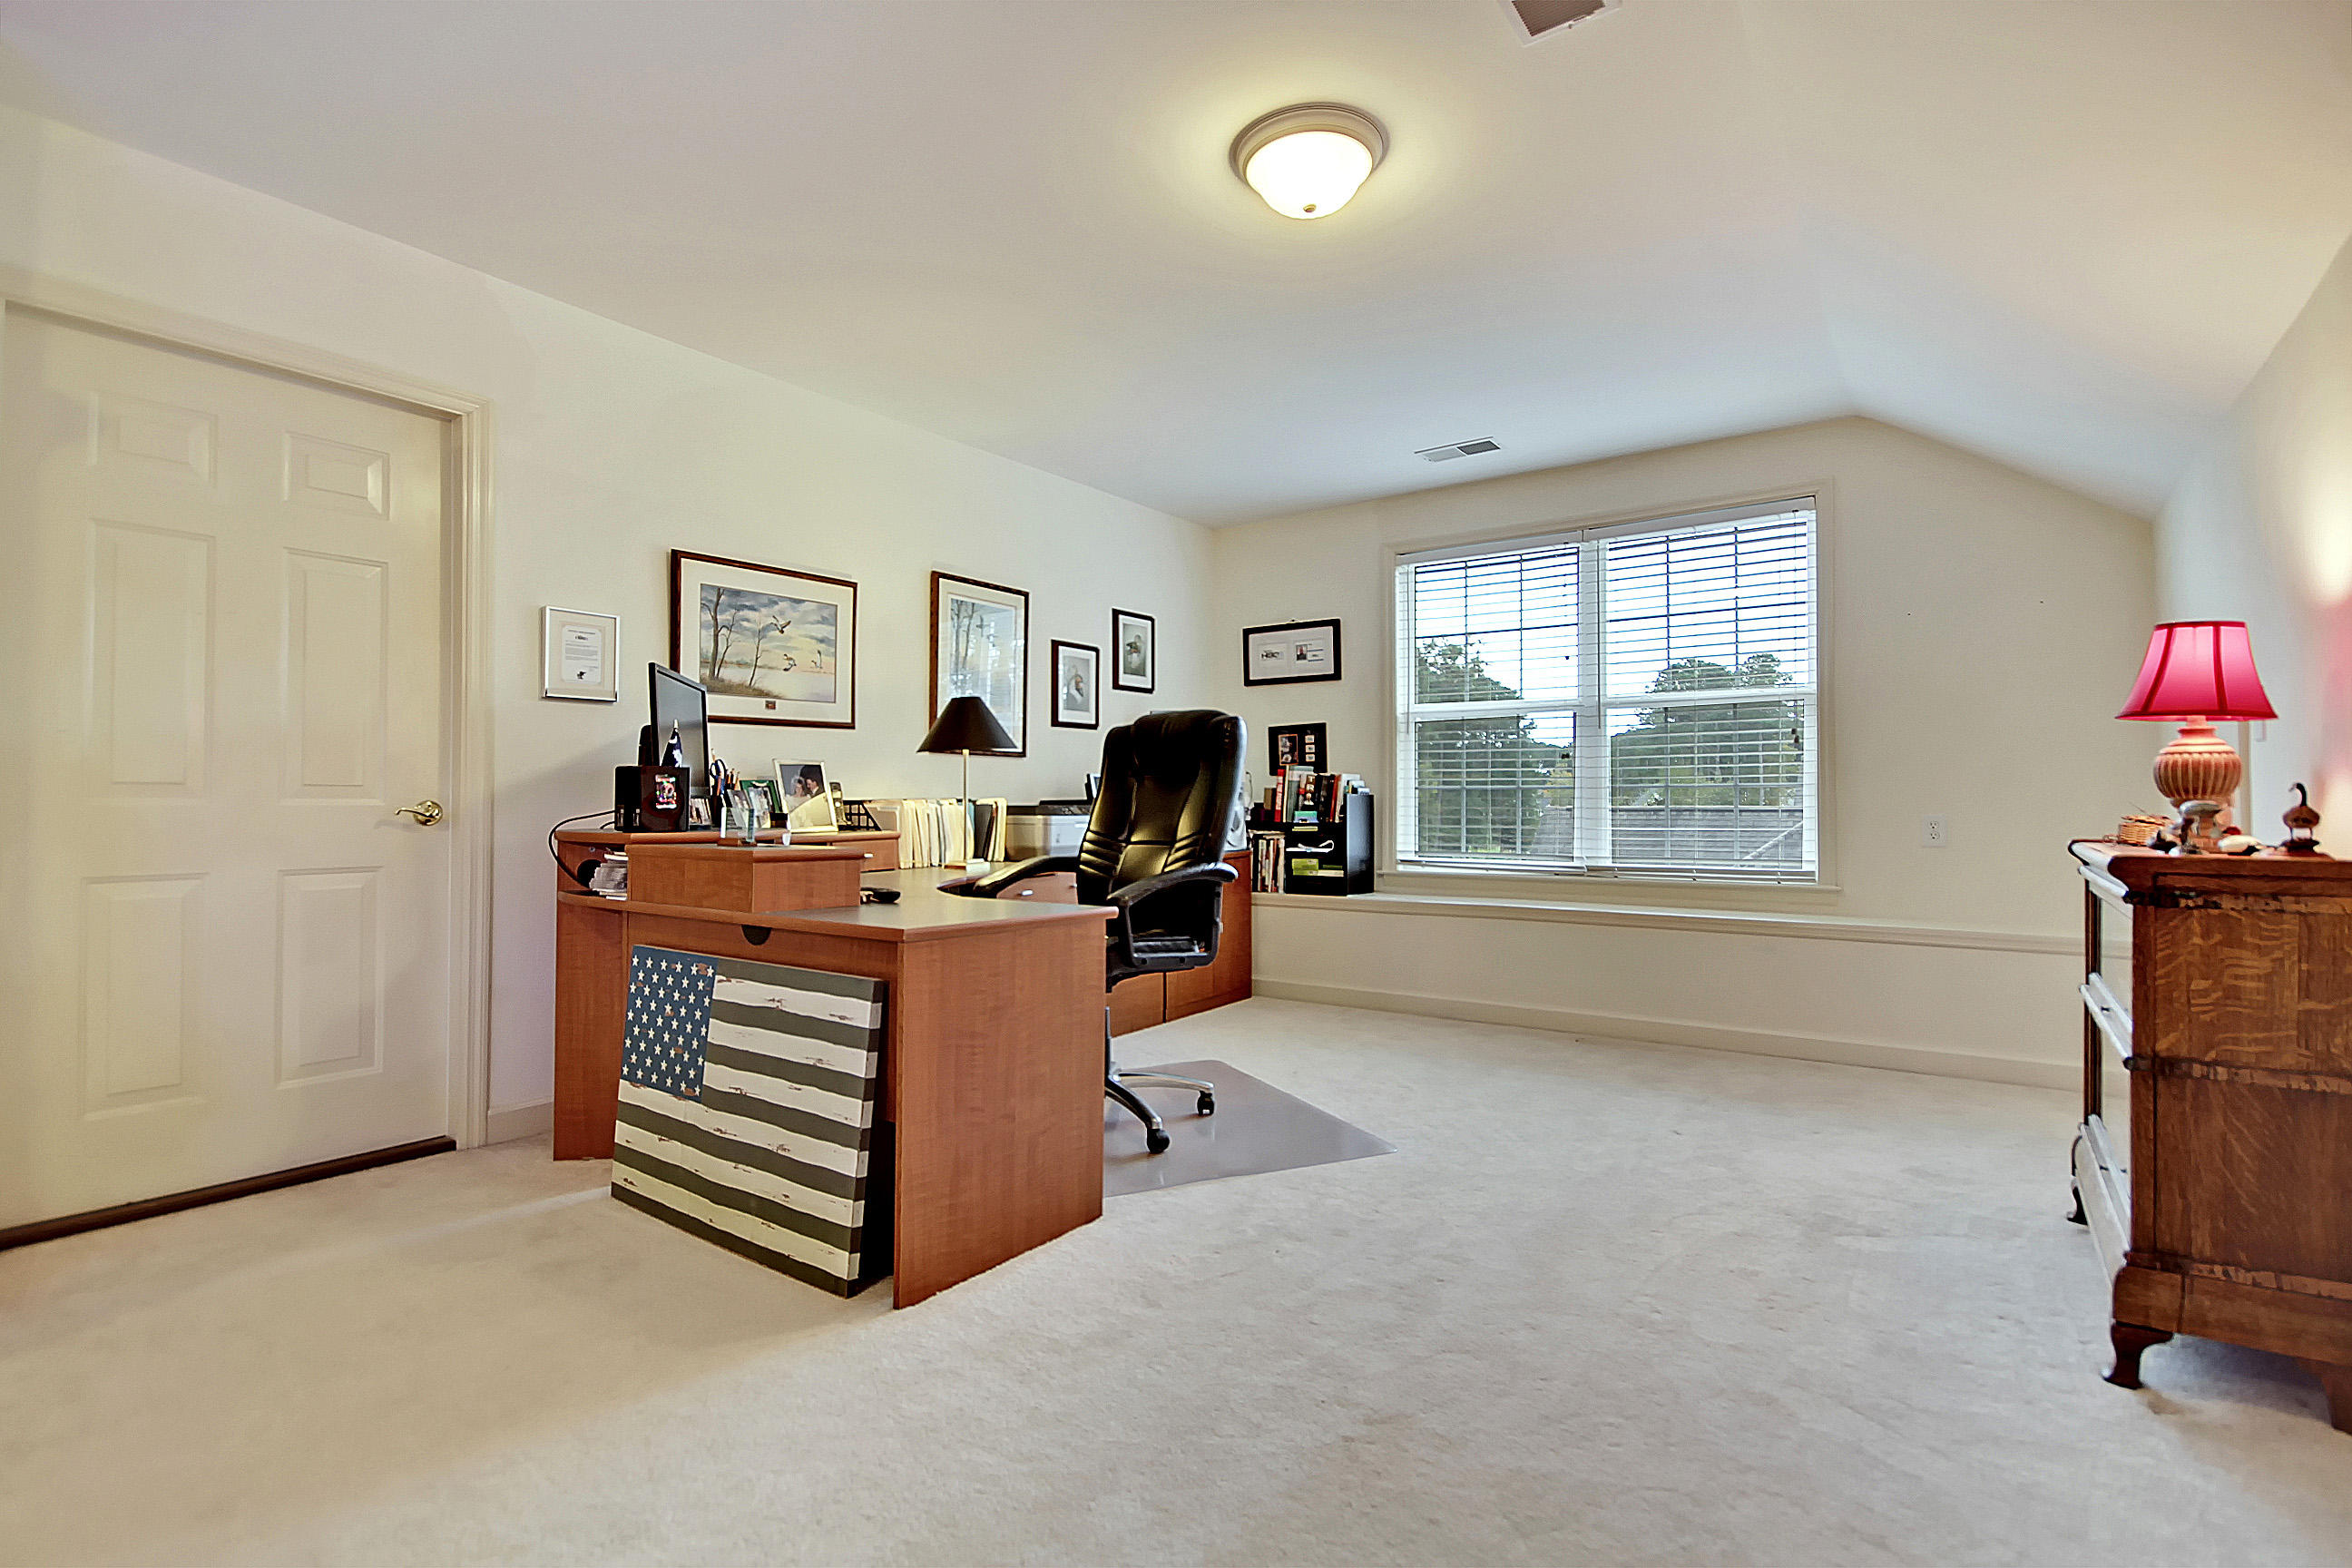 Dunes West Homes For Sale - 2449 Darts Cove, Mount Pleasant, SC - 17